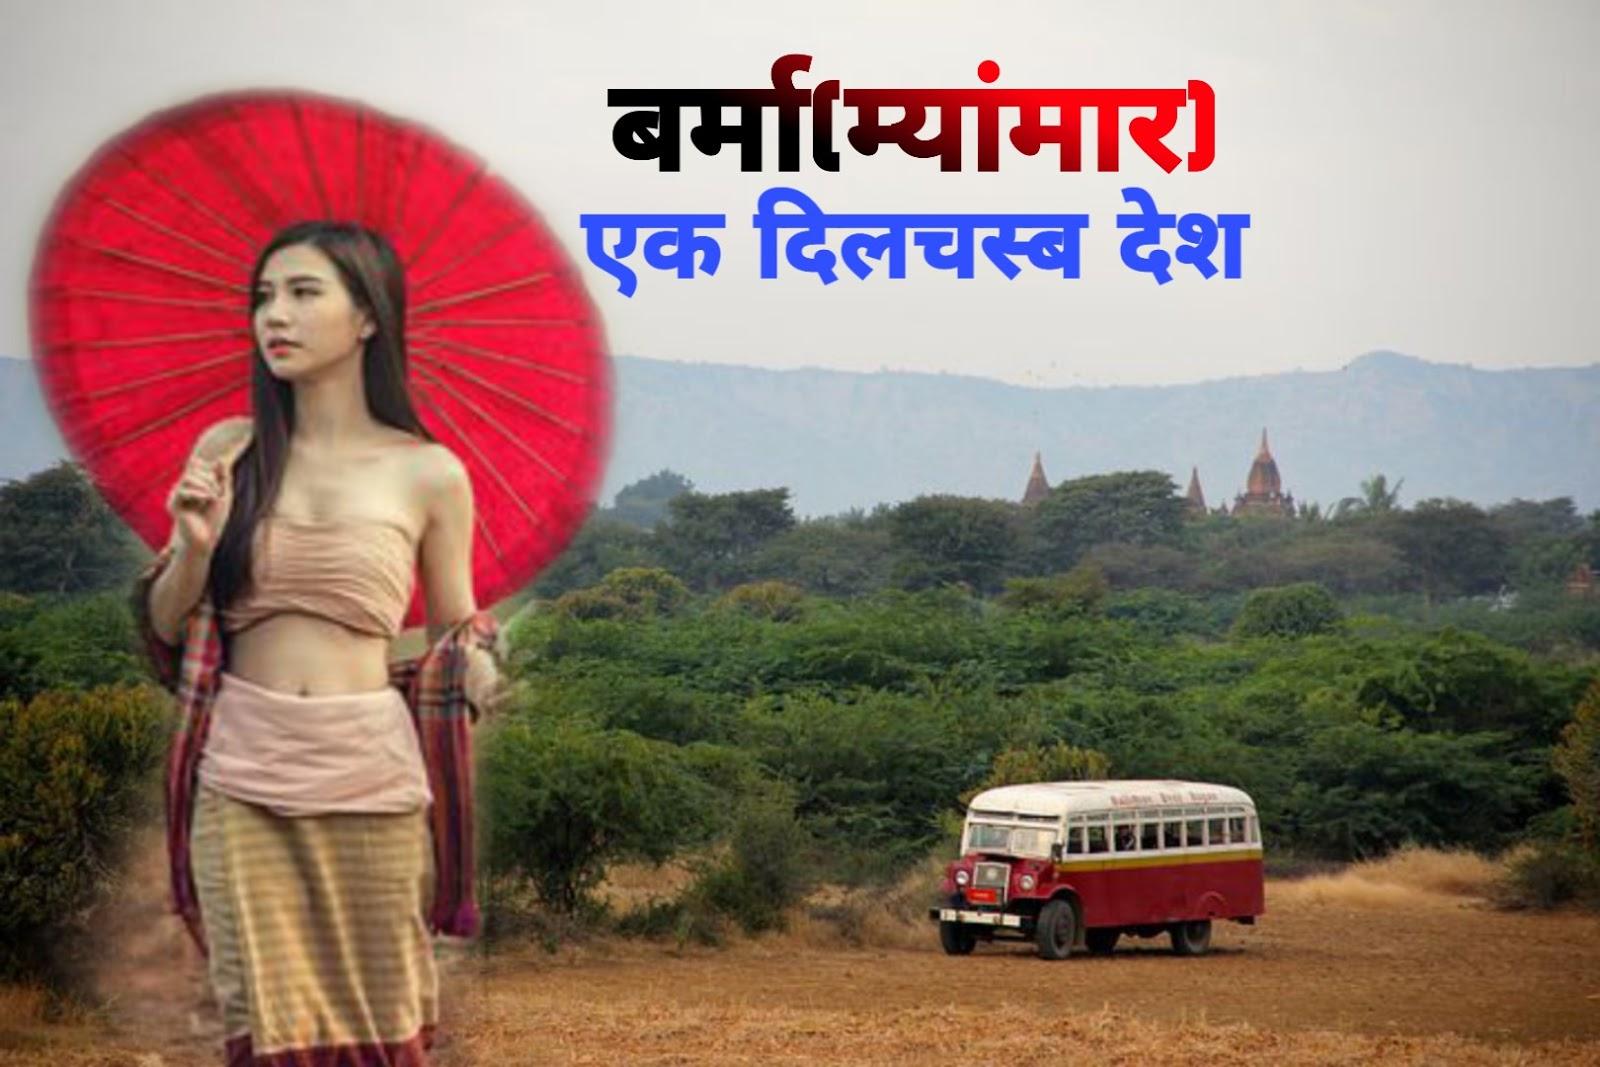 Amazing facts about Myanmar in Hindi - म्यांमार के बारे में 16 अद्बुत बाते और तथ्य